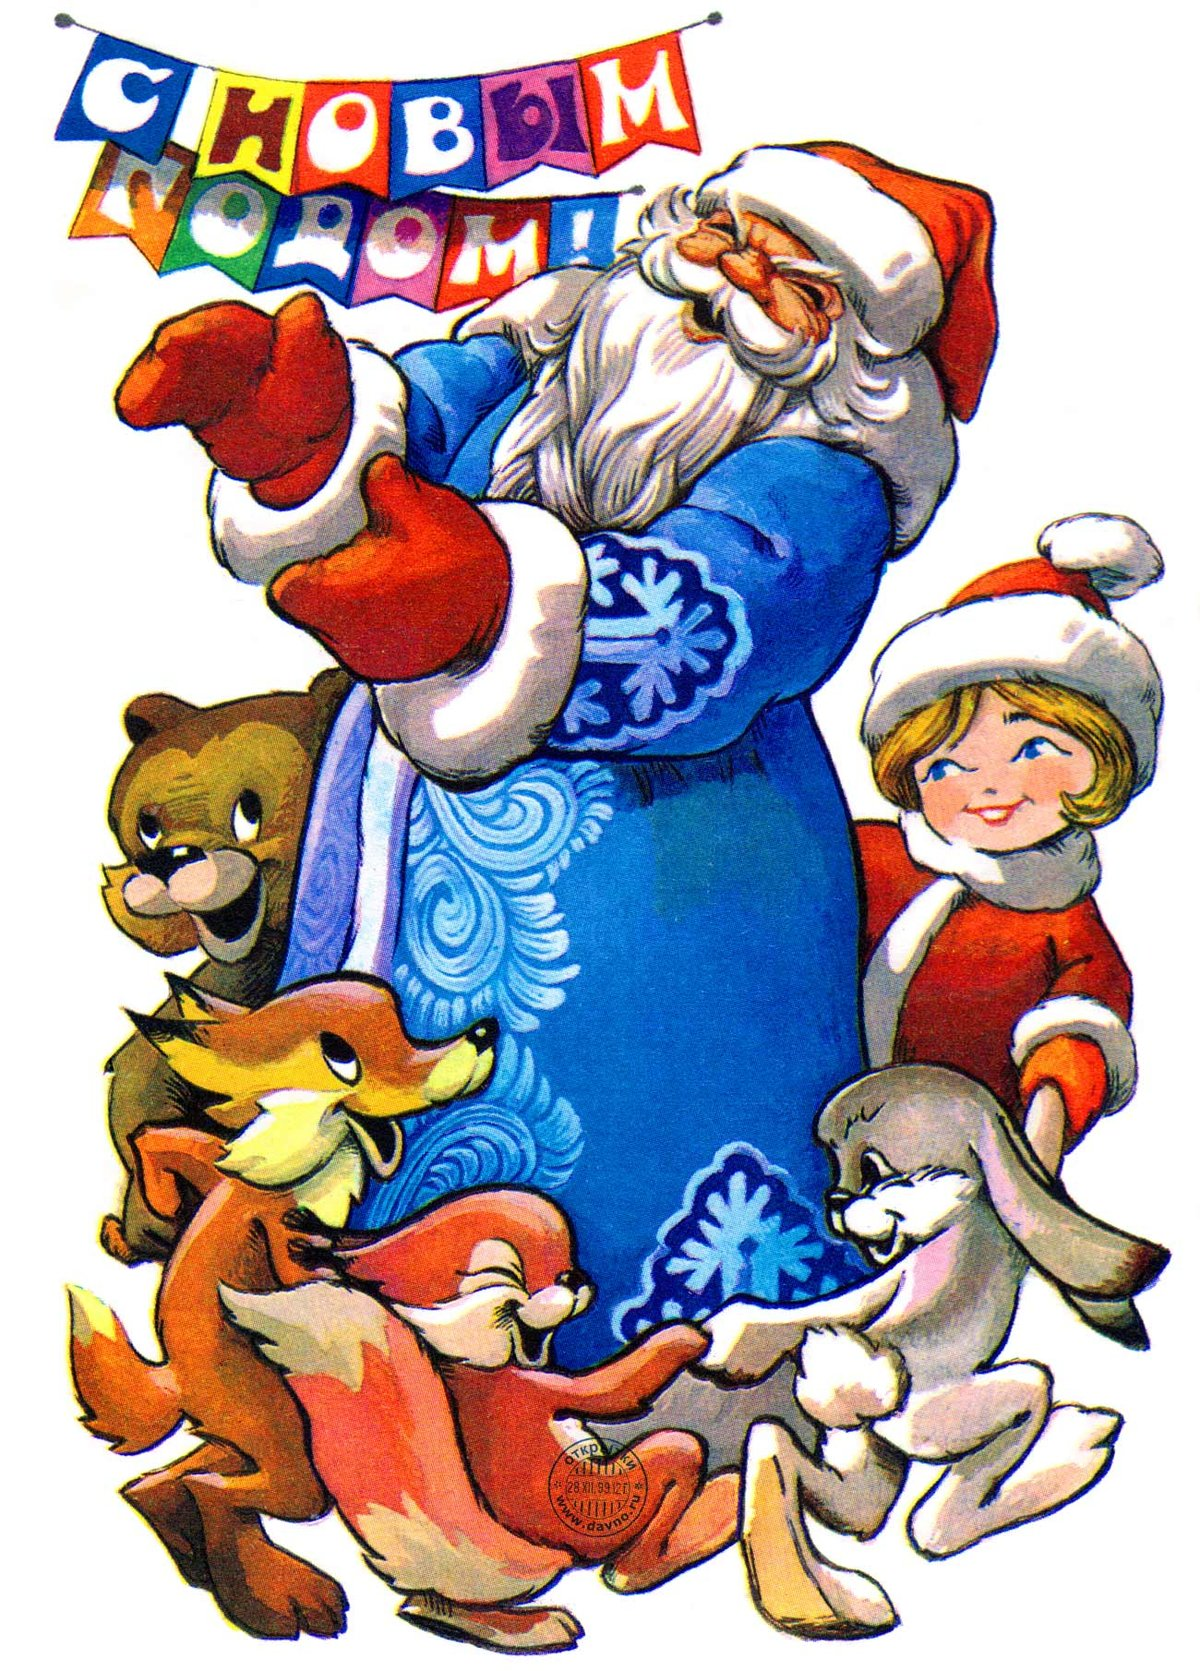 Дед мороз и снегурочка советские картинки, открытка марта